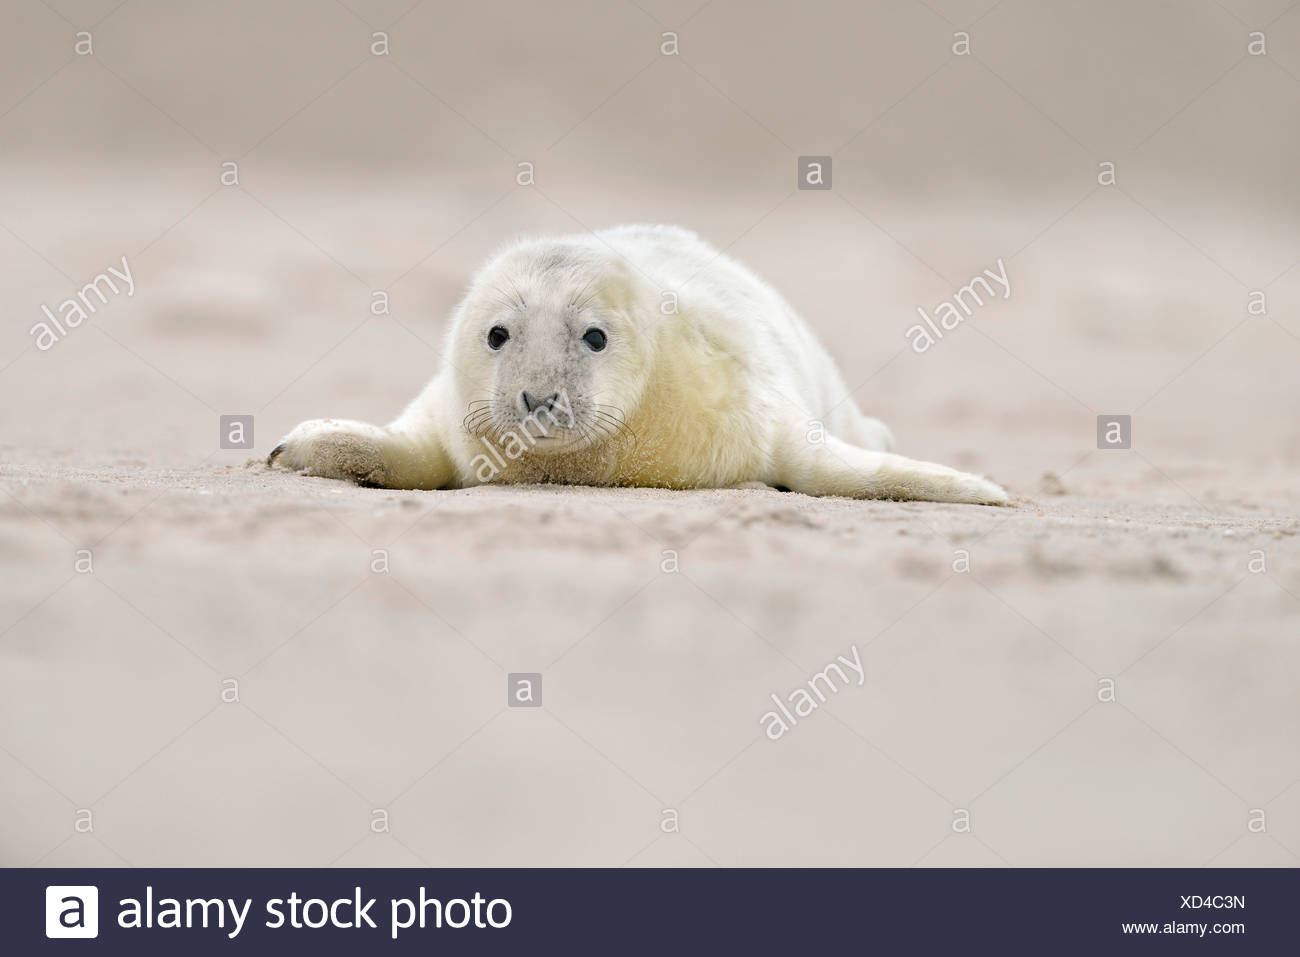 Young gray seal (Halichoerus grypus) on the beach, Düne island, Helgoland, Schleswig-Holstein, Germany Stock Photo